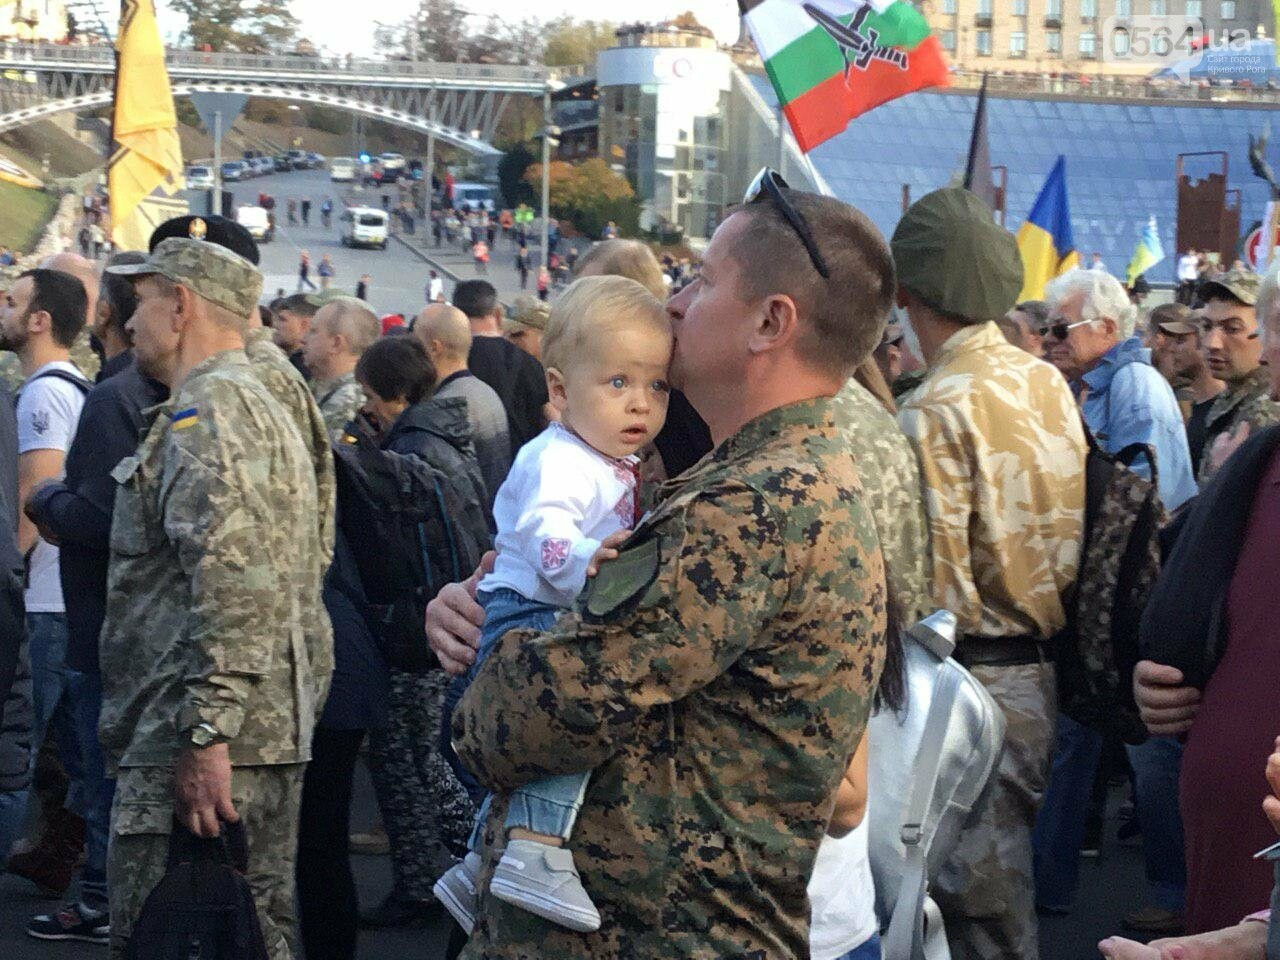 Криворожане поддержали Марш сопротивления капитуляции в Киеве, - ФОТО, ВИДЕО, ОБНОВЛЕНО, фото-29